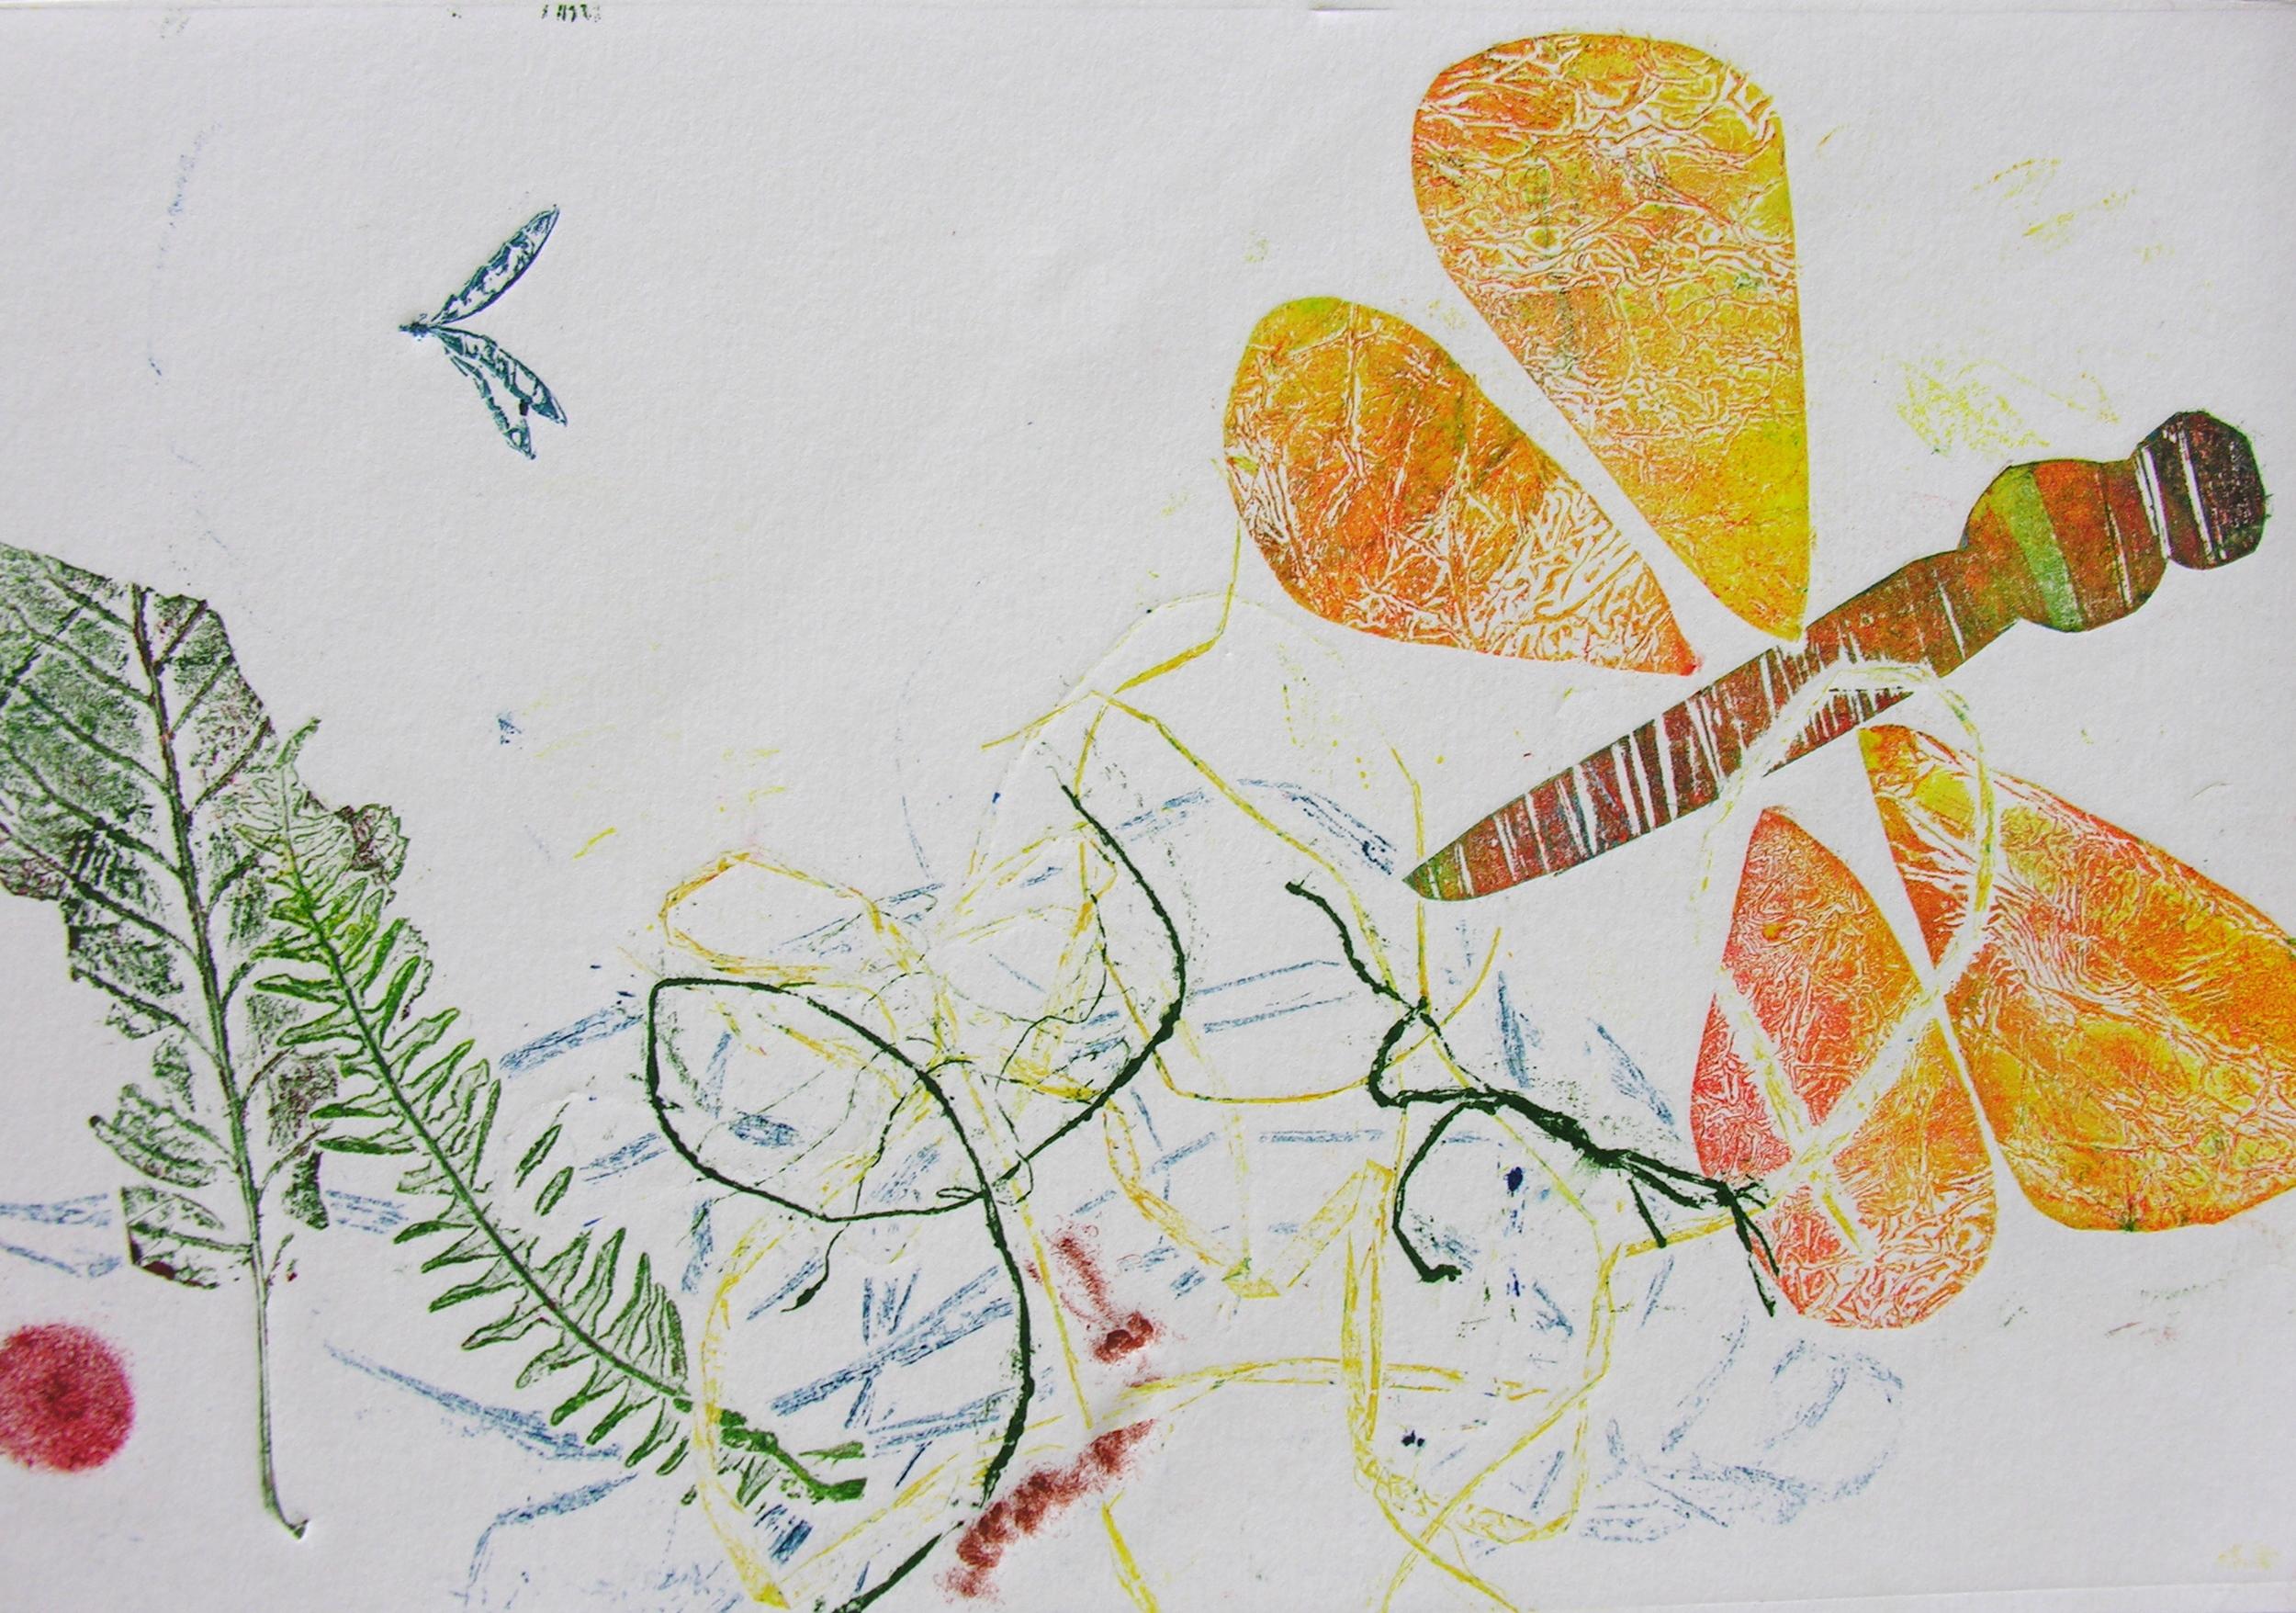 Breath of Fresh Air, Idle Valley, Print